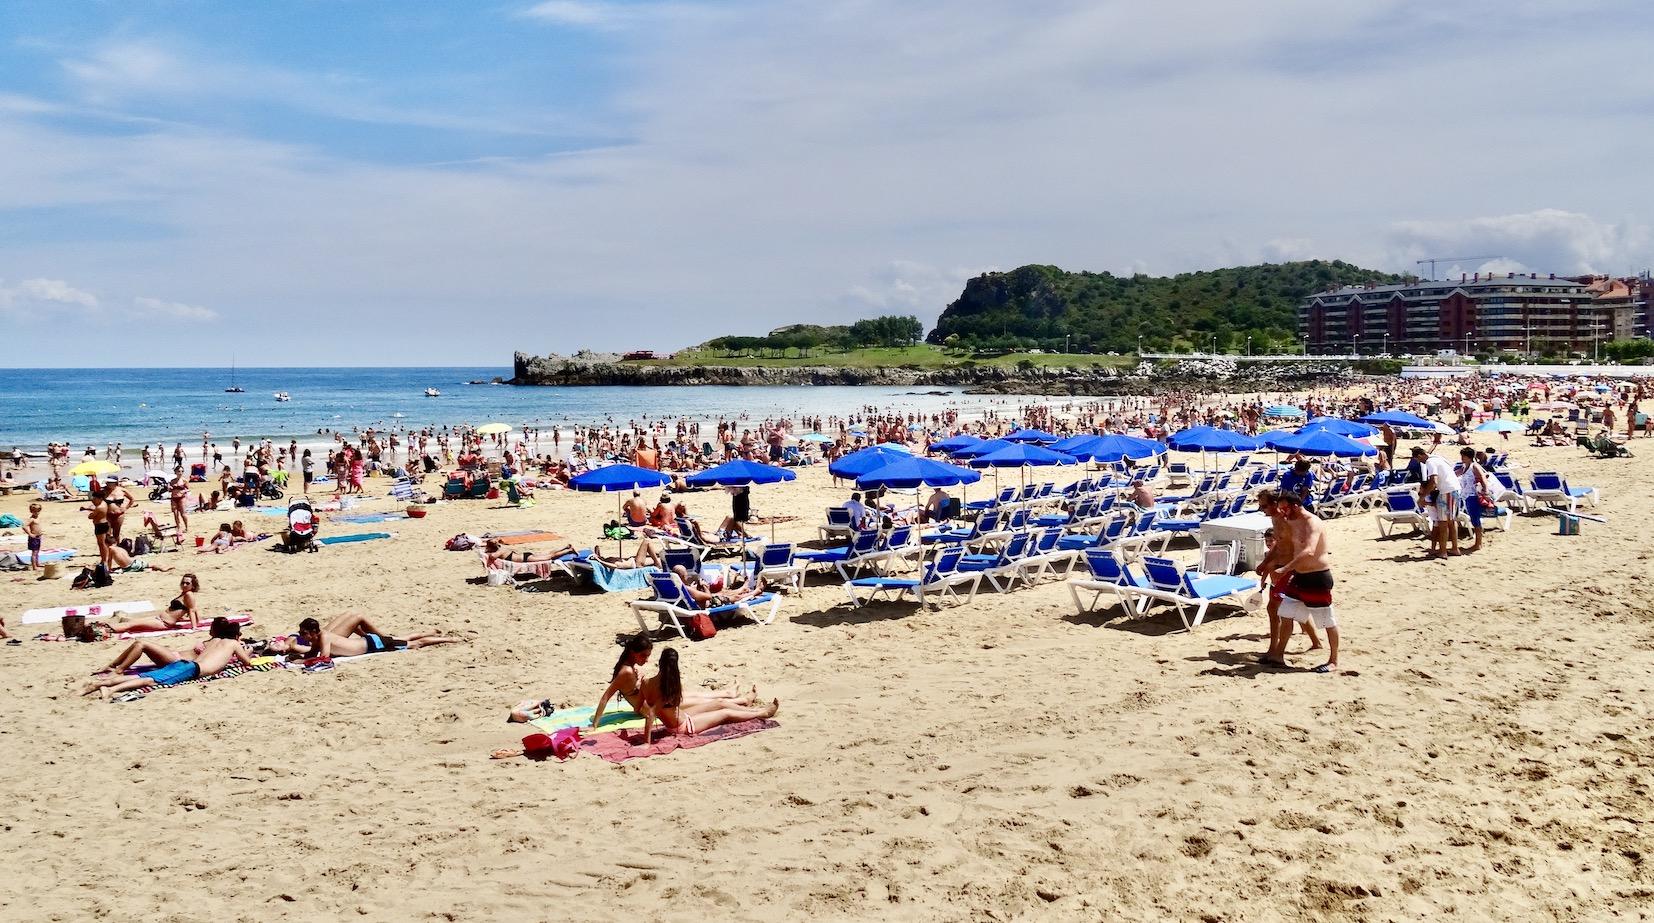 Brazomar Beach in Castro Urdiales